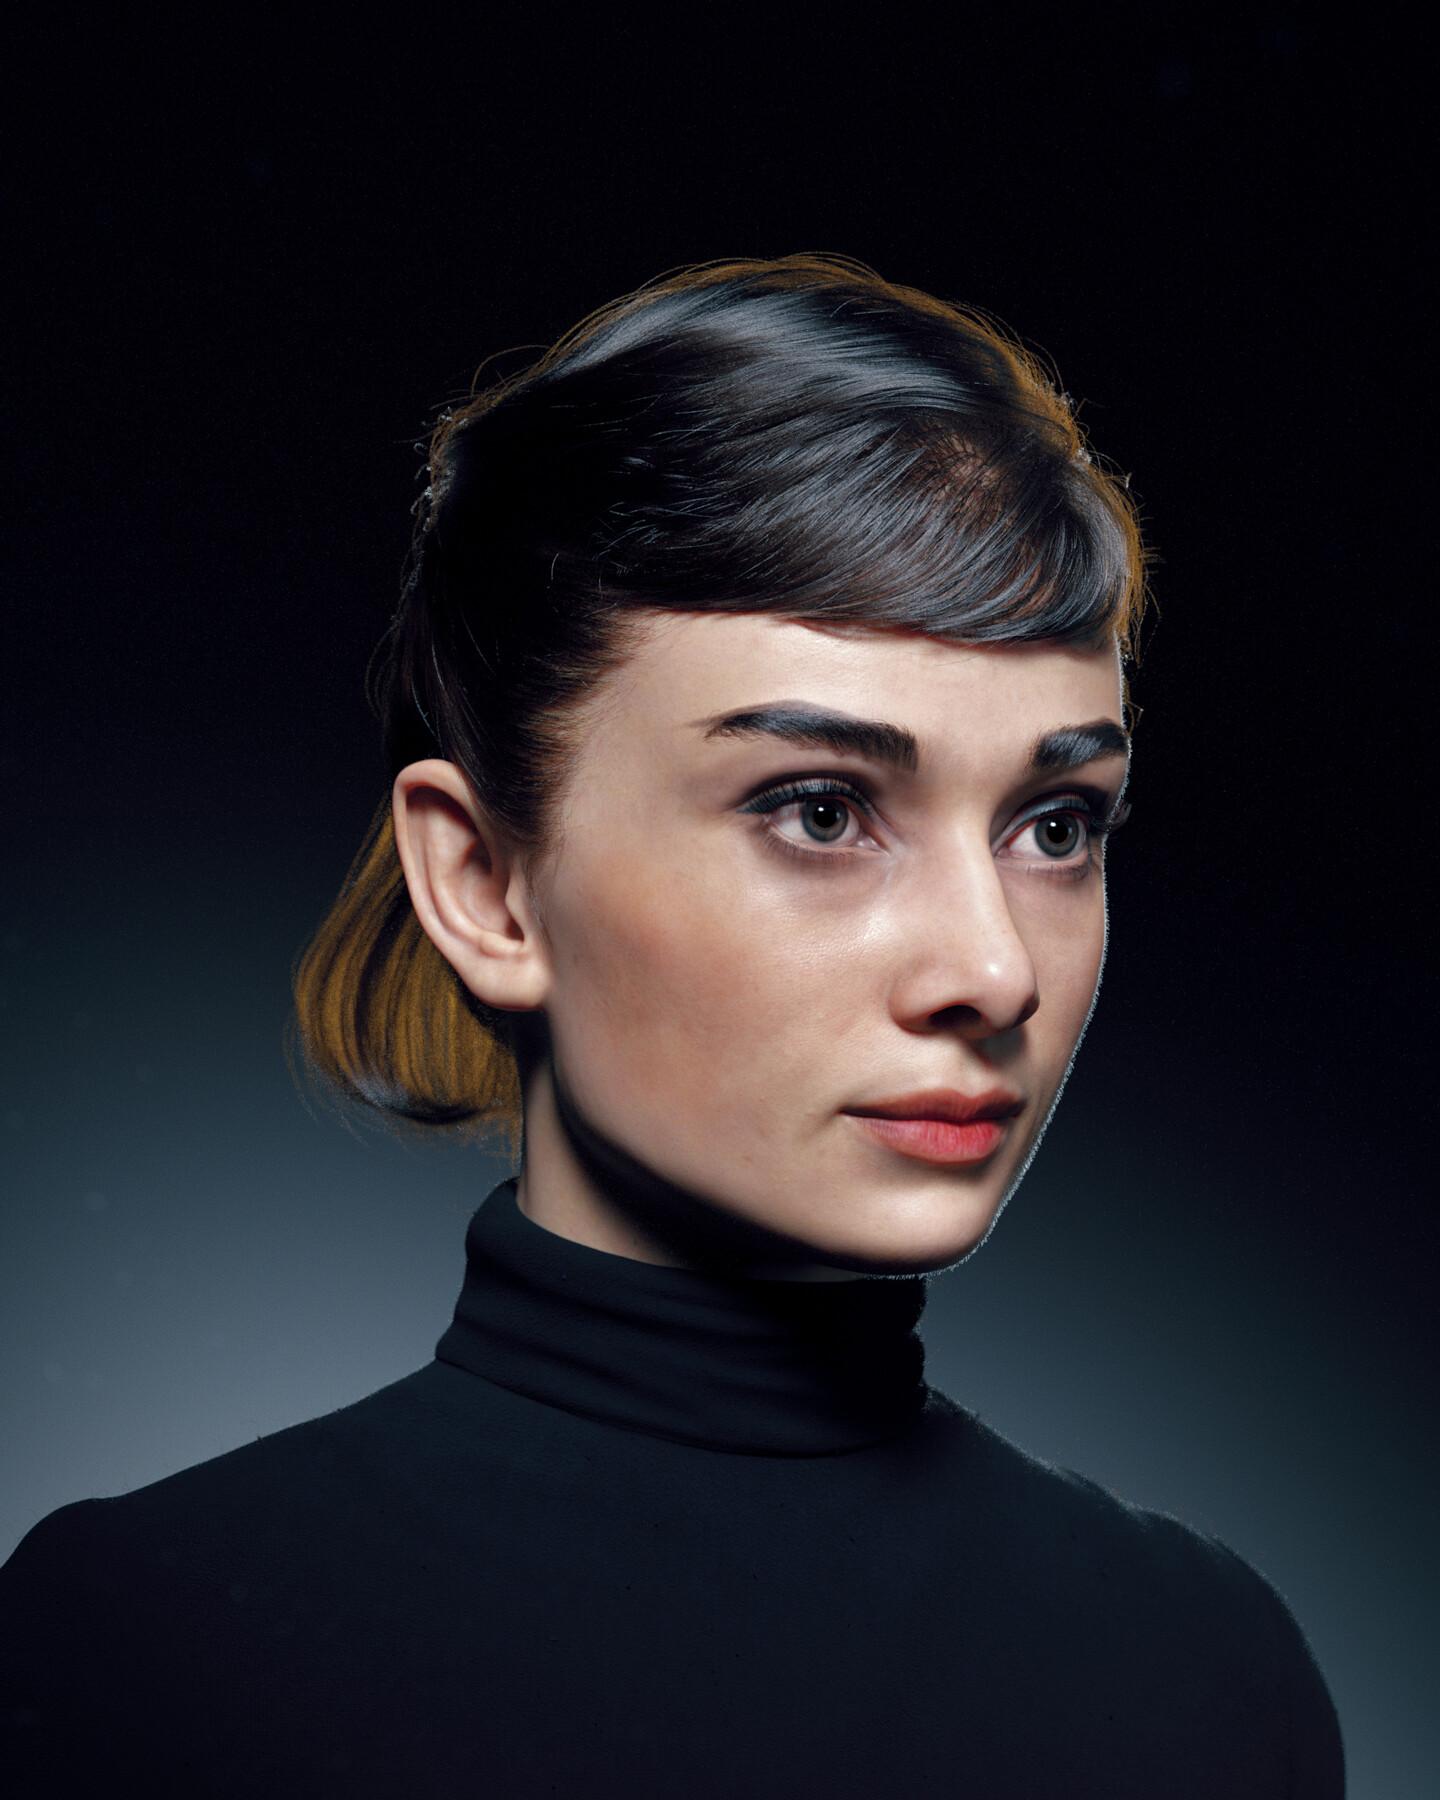 hadi karimi audry hepburn 3D portrait